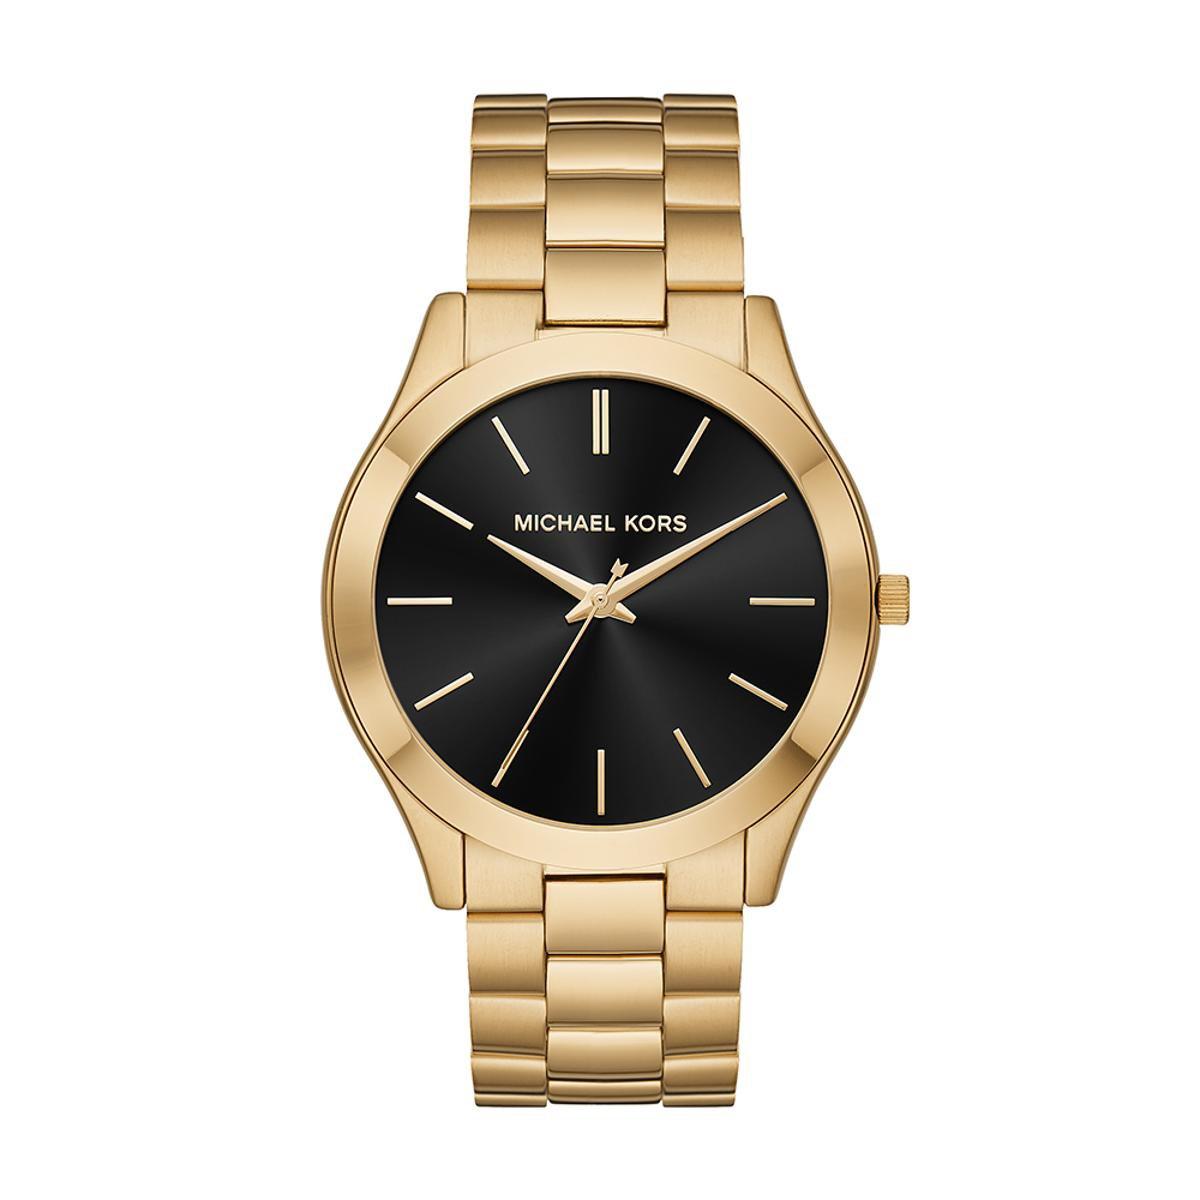 df00cb0cbbb2d Relógio Michael Kors Feminino Slim Runway - MK8621 1DN MK8621 1DN - Dourado  - Compre Agora